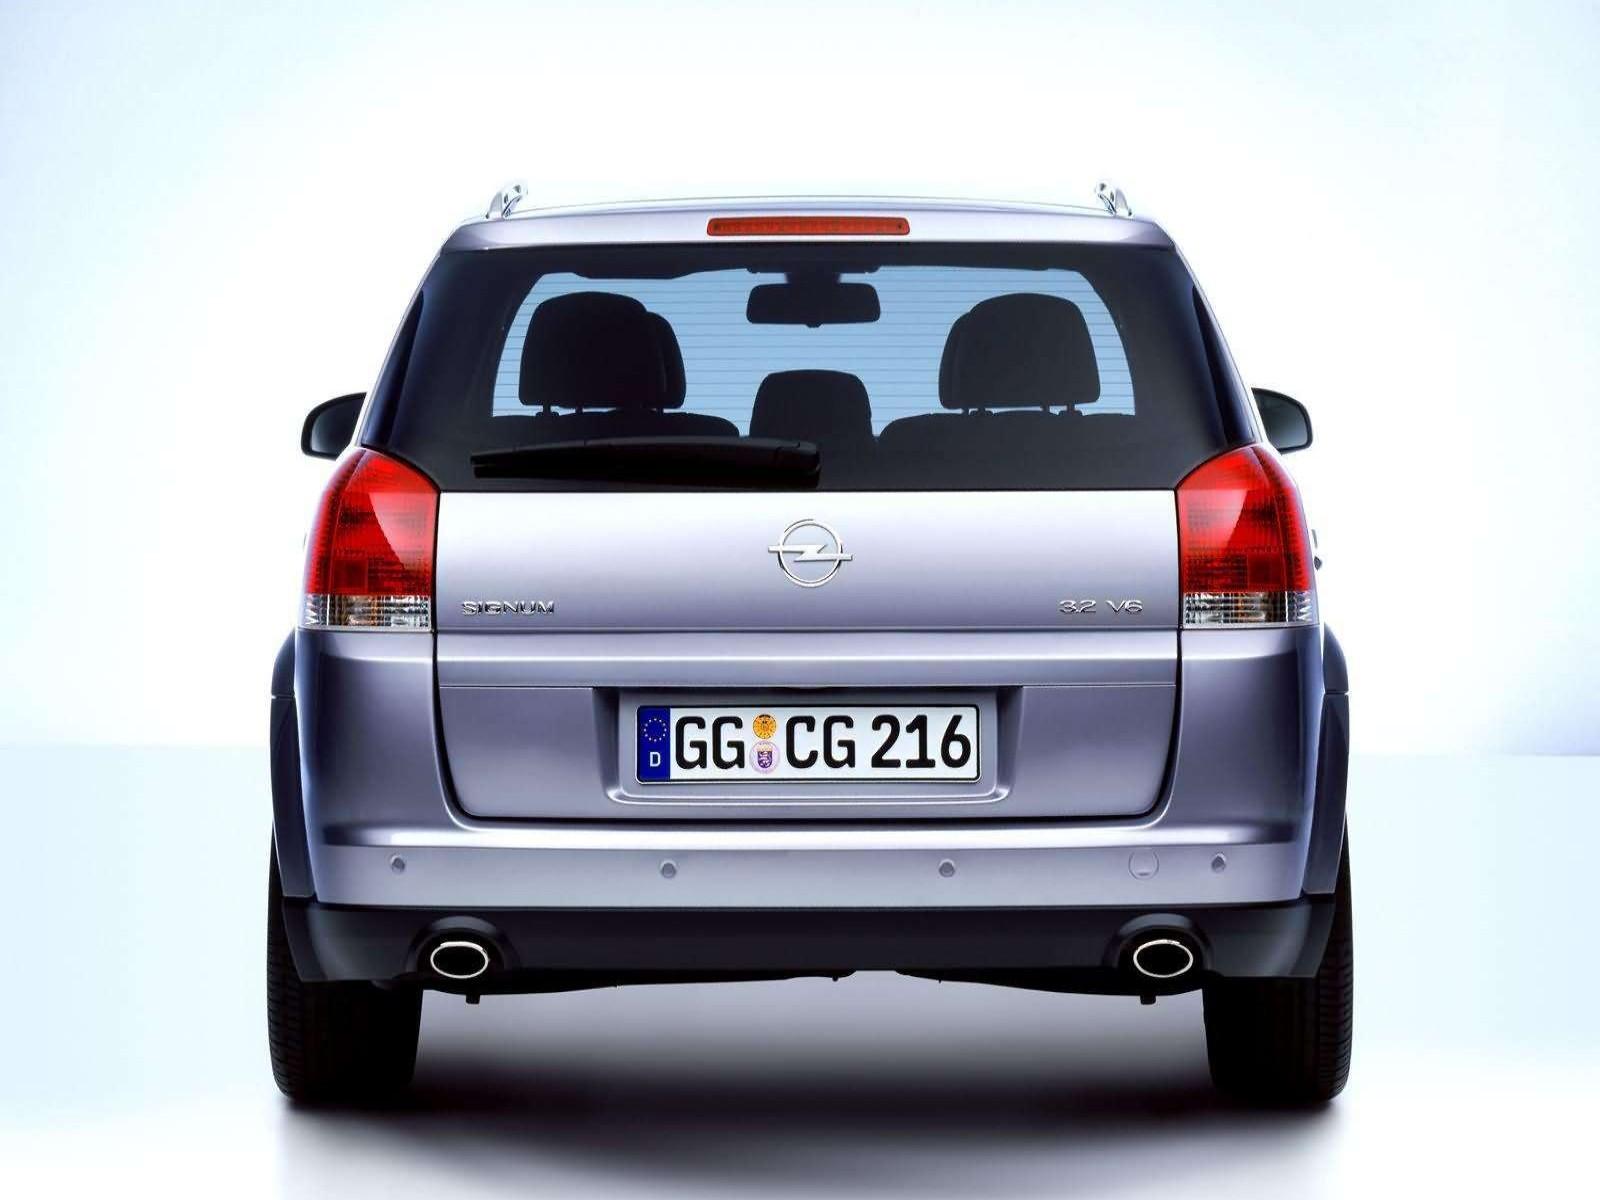 Car and car zone opel signum 32 v6 2003 new cars car reviews opel signum 32 v6 2003 vanachro Images